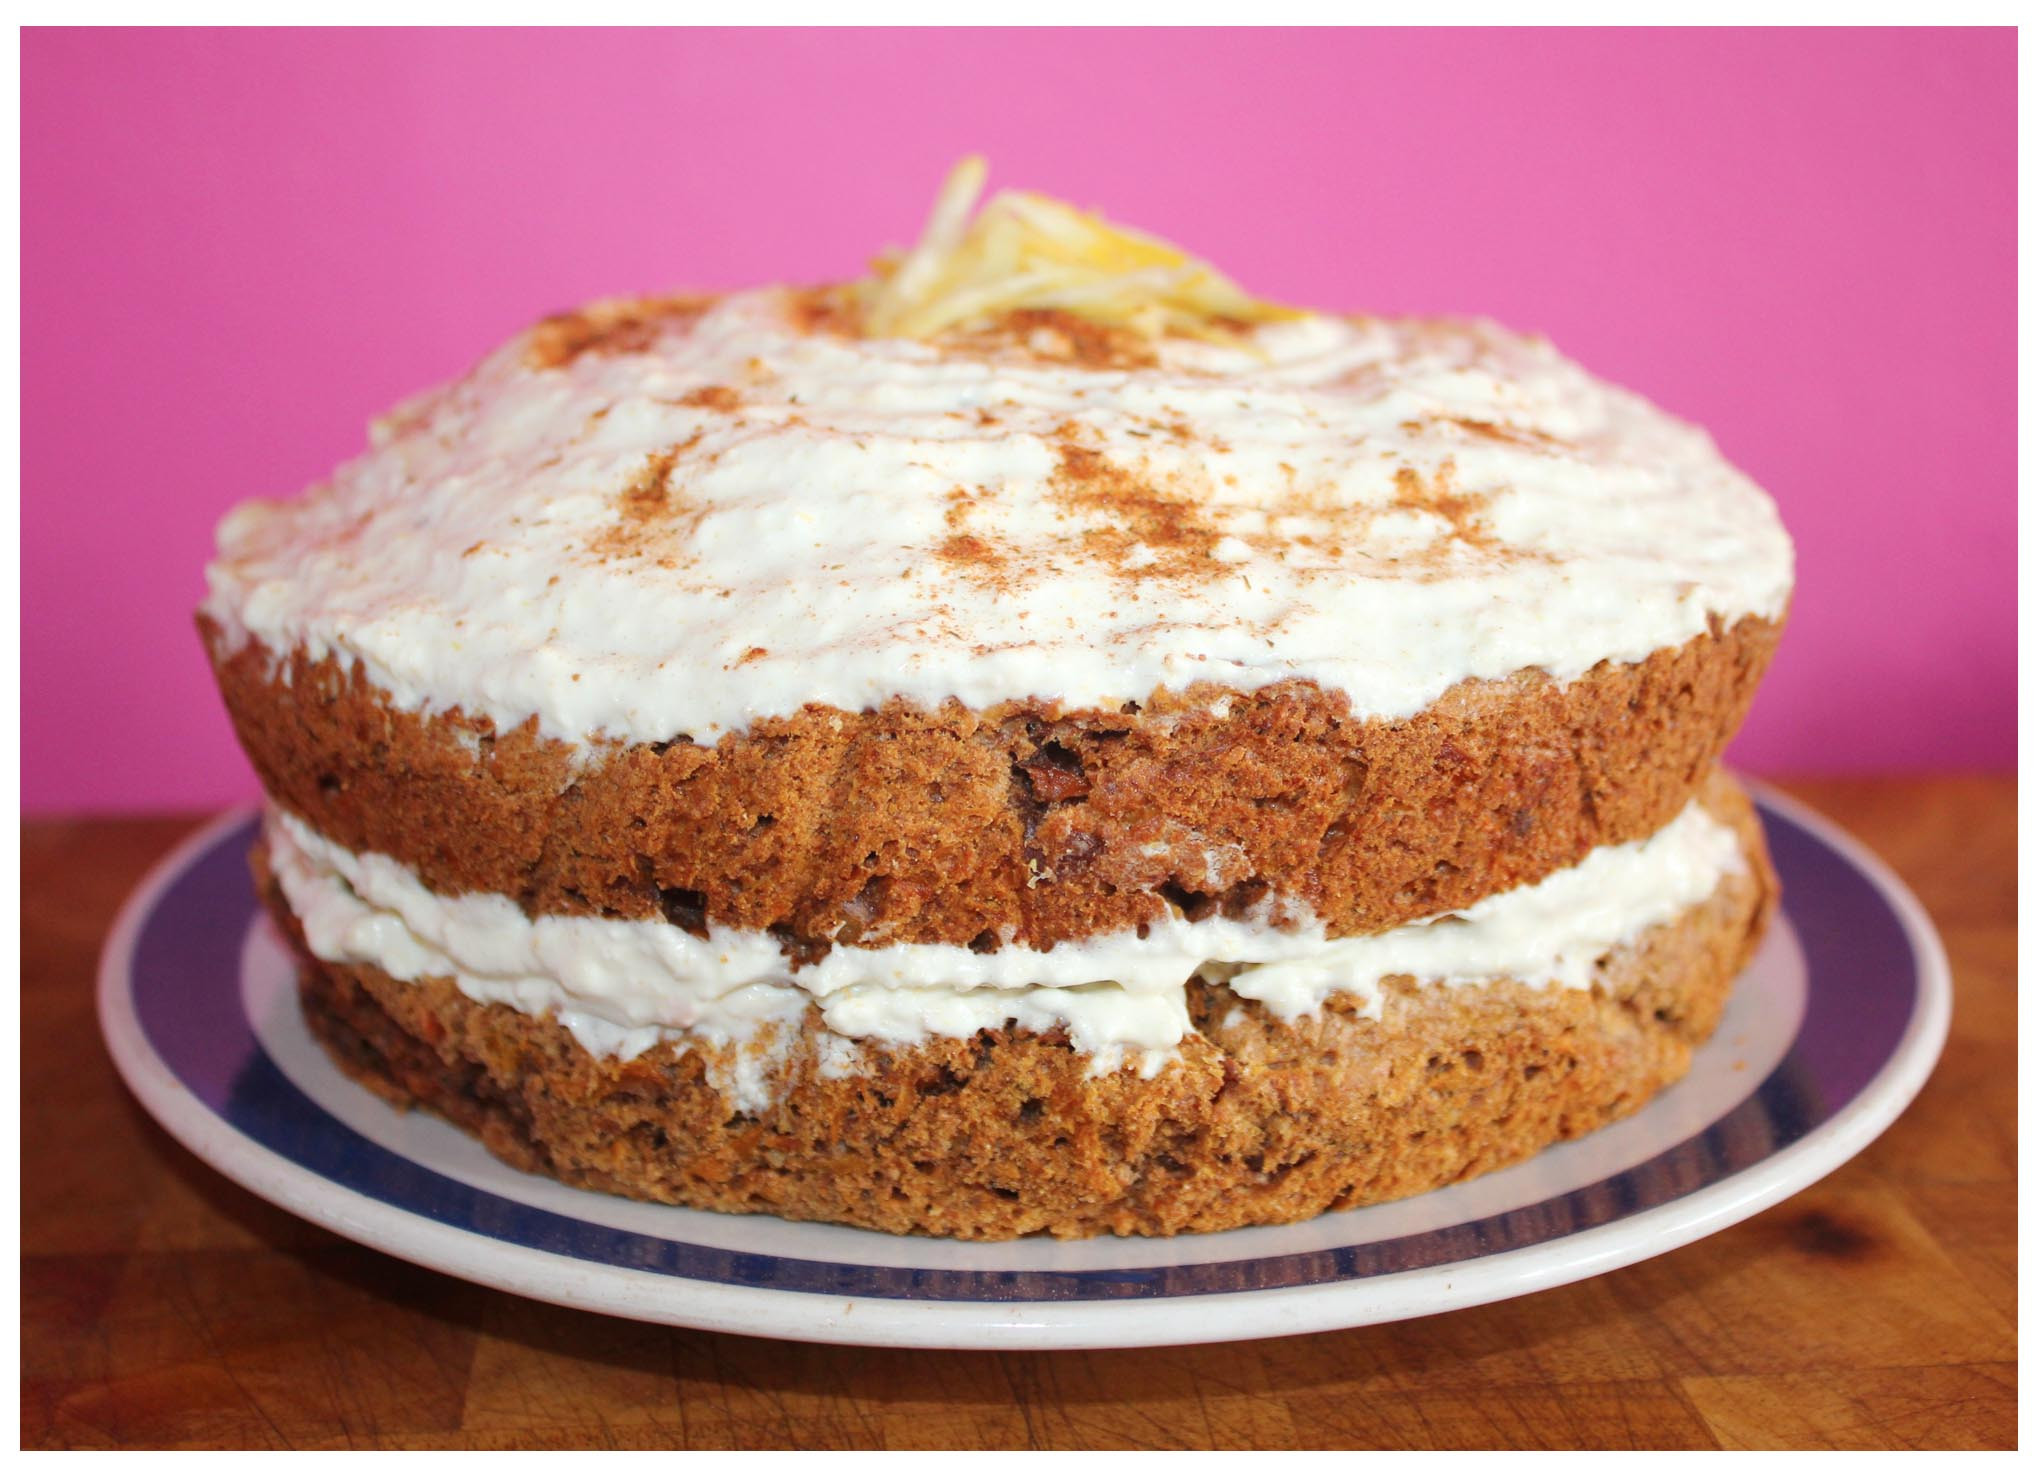 Diabetic Cake Recipes From Scratch  Sugar Free Dessert Recipes For Diabetics